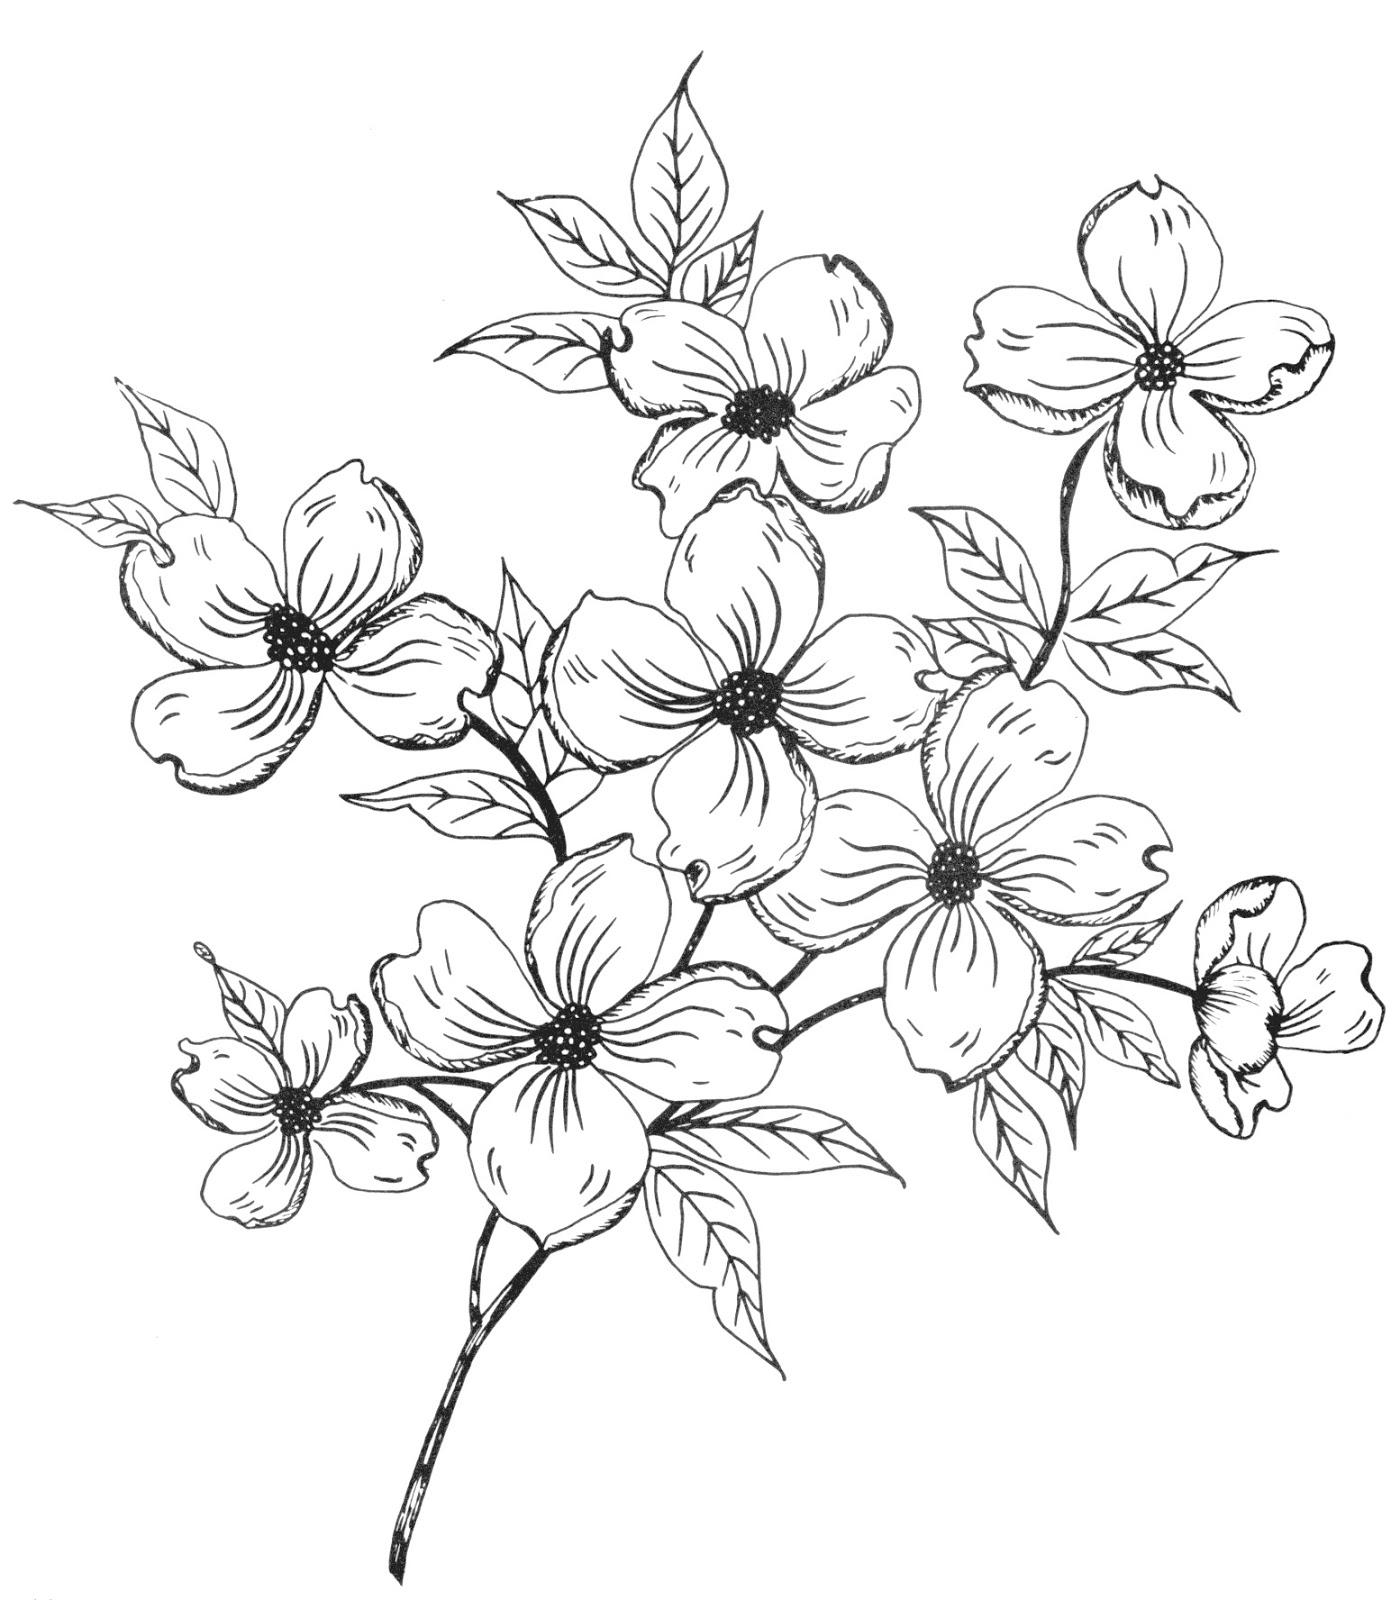 1400x1600 Drawn Plant Flowering Tree